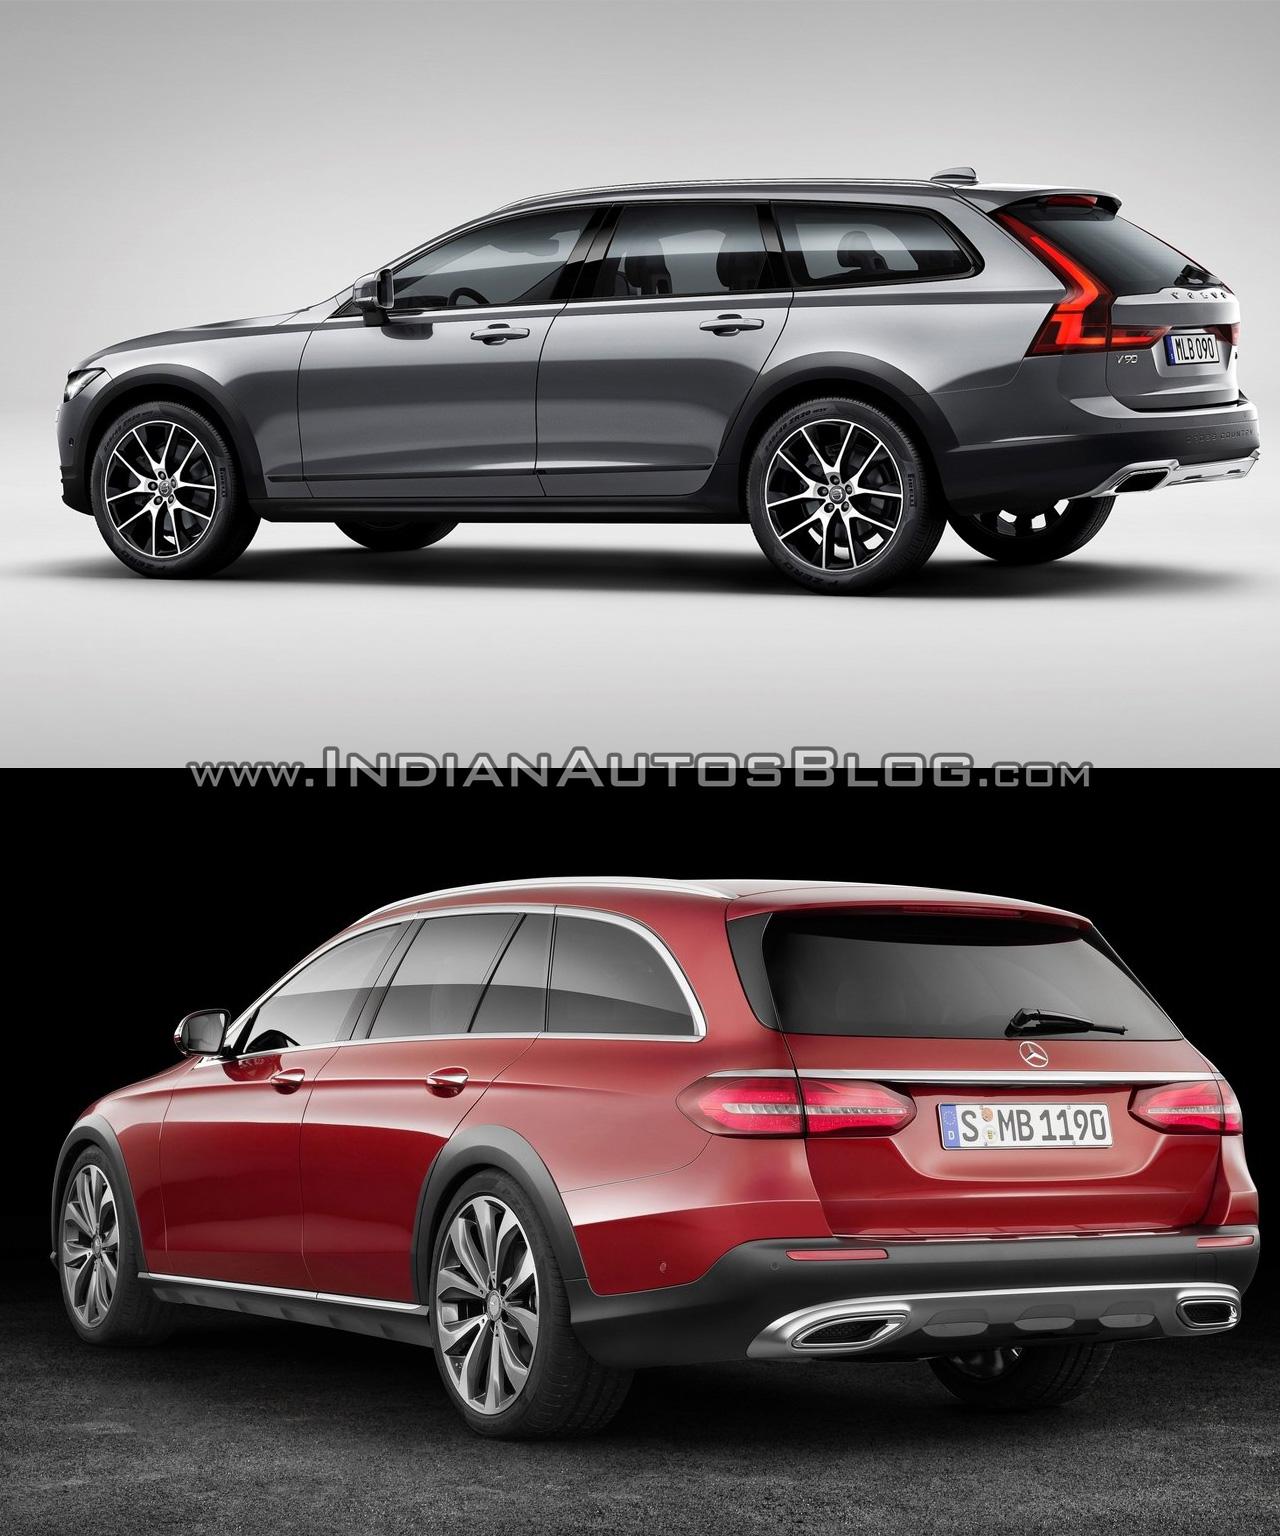 Volvo V90 CC vs Mercedes E-Class All-Terrain - In Images